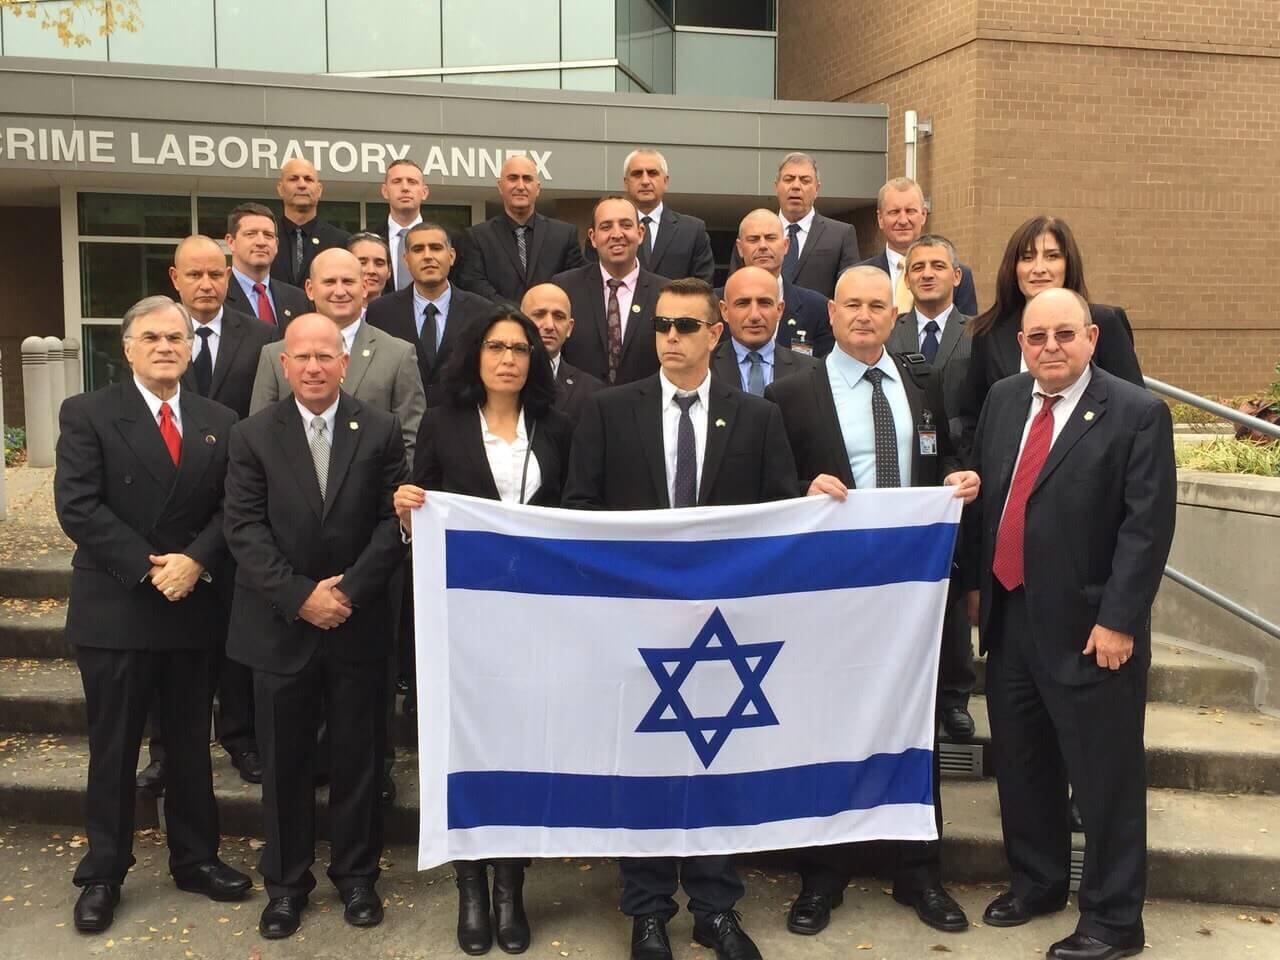 An Israeli delegation visits the Georgia Bureau of Investigations in 2014. (Photo: Georgia State University)